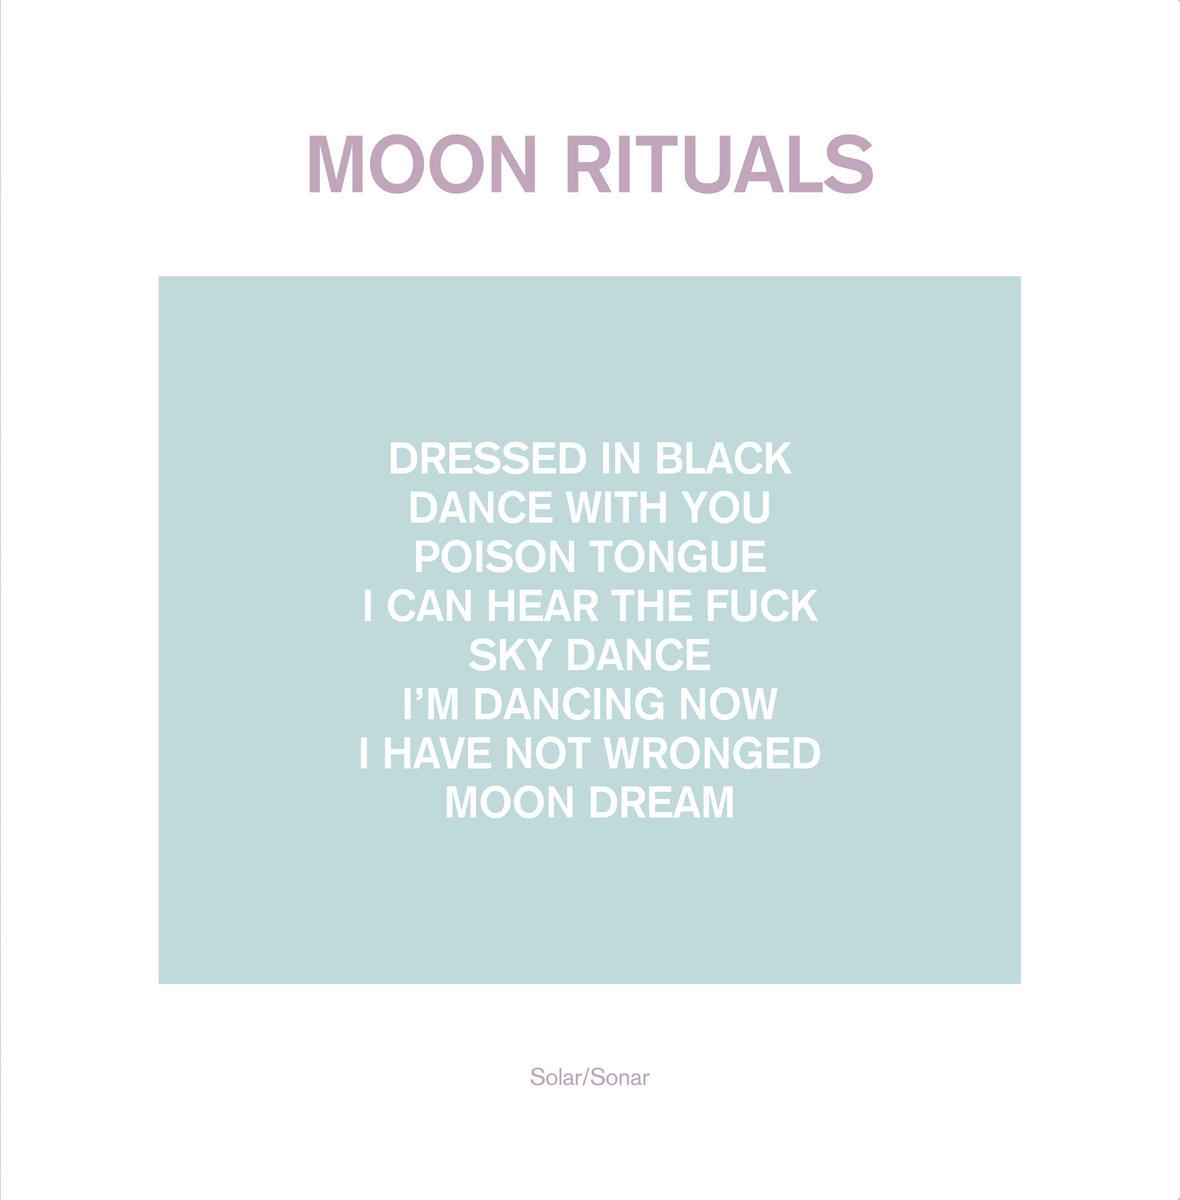 Moon Rituals | Solar/Sonar